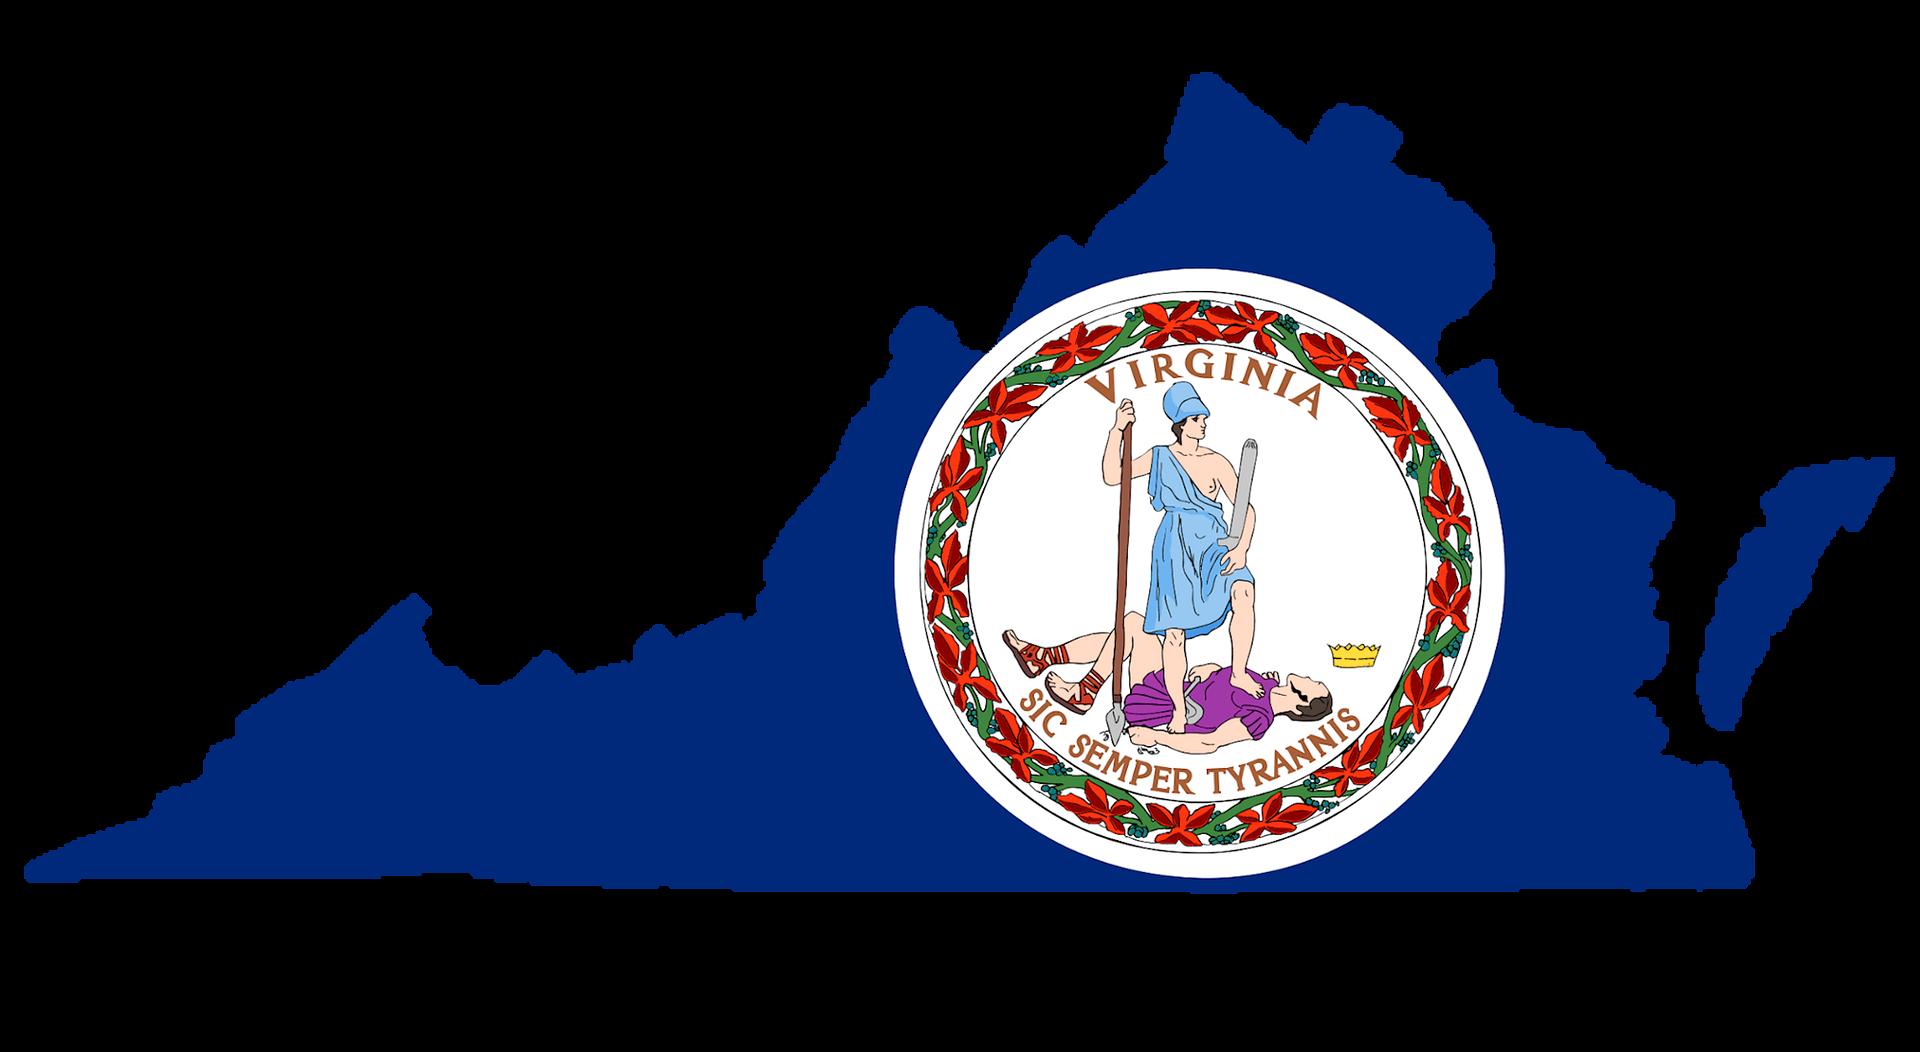 Virginia Petroleum Environmental Consulting